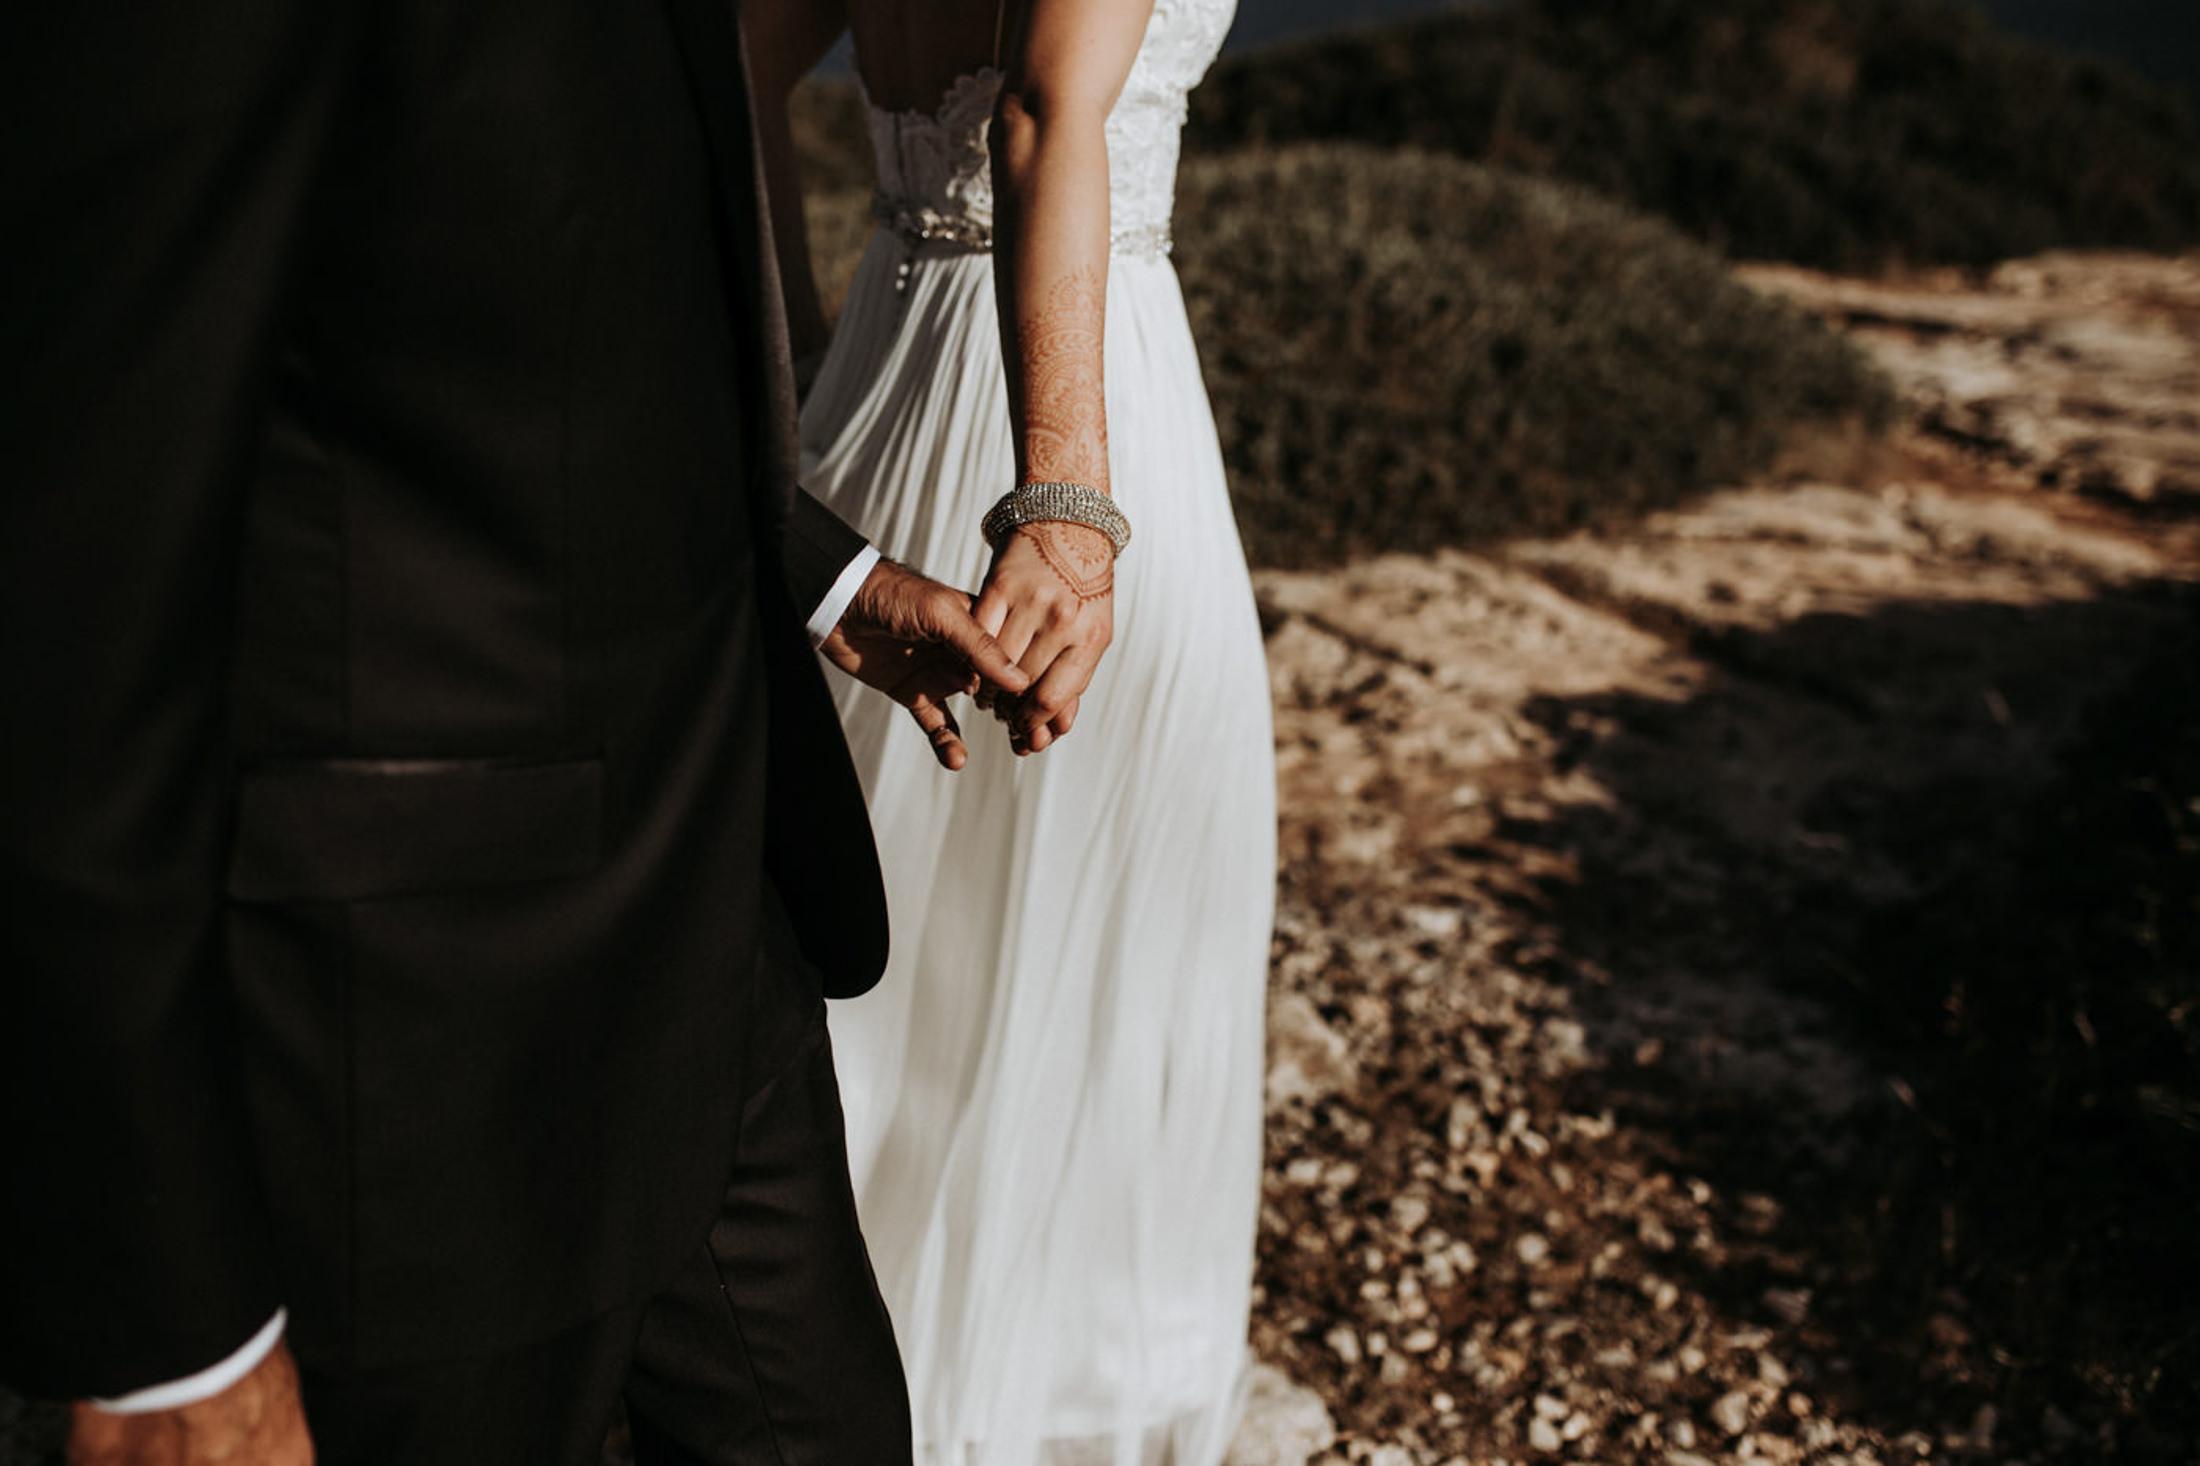 Wedding_Photographer_Mallorca_Daniela-Marquardt_Photography_New_York_Iceland_Tuscany_Santorini_Portugal_Austria_Bavaria_Elopement_Hochzeitsfotograf_AntjeRajat2_79